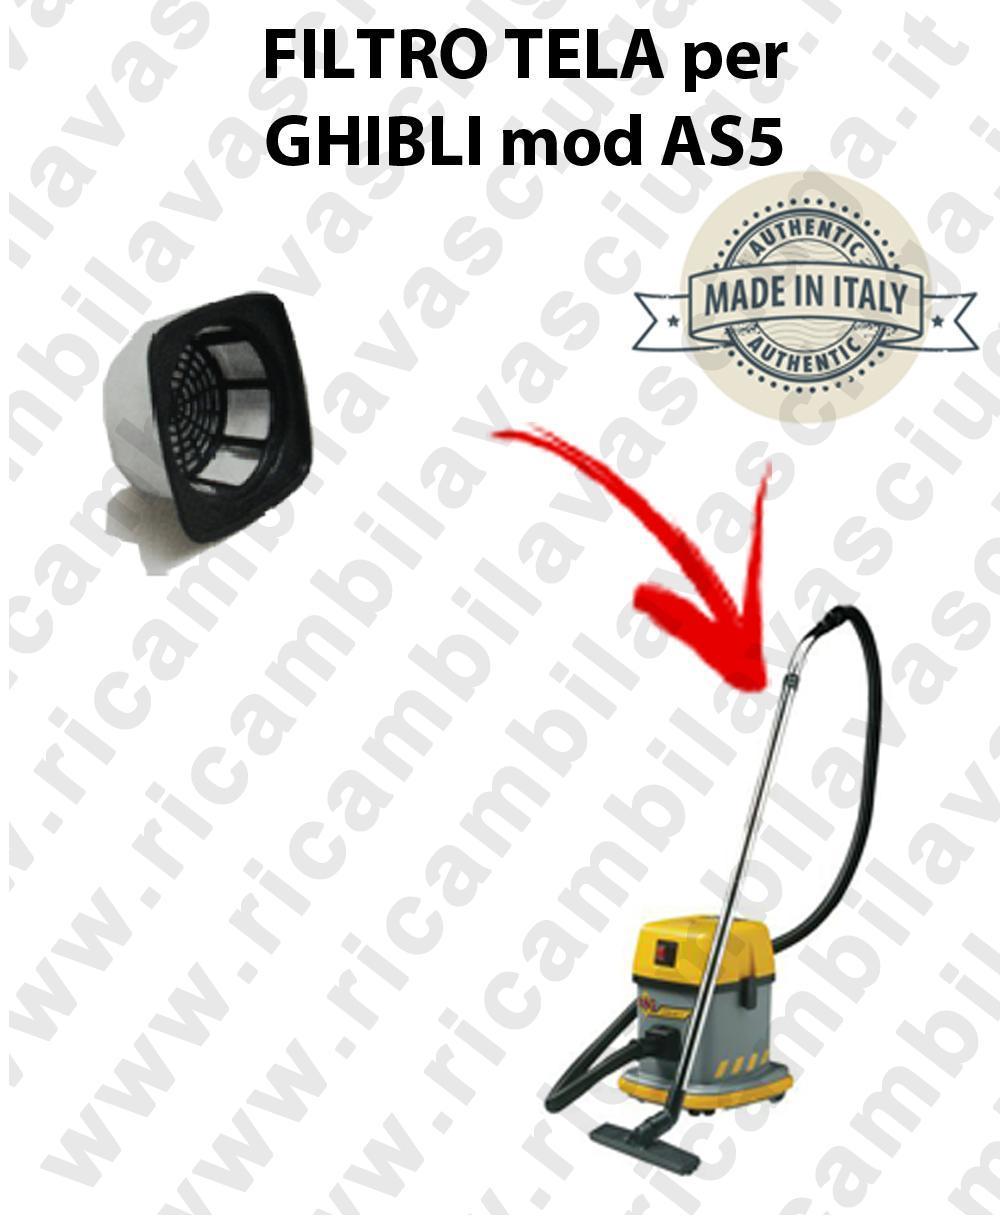 Filtro de tela para aspiradora GHIBLI Model AS5